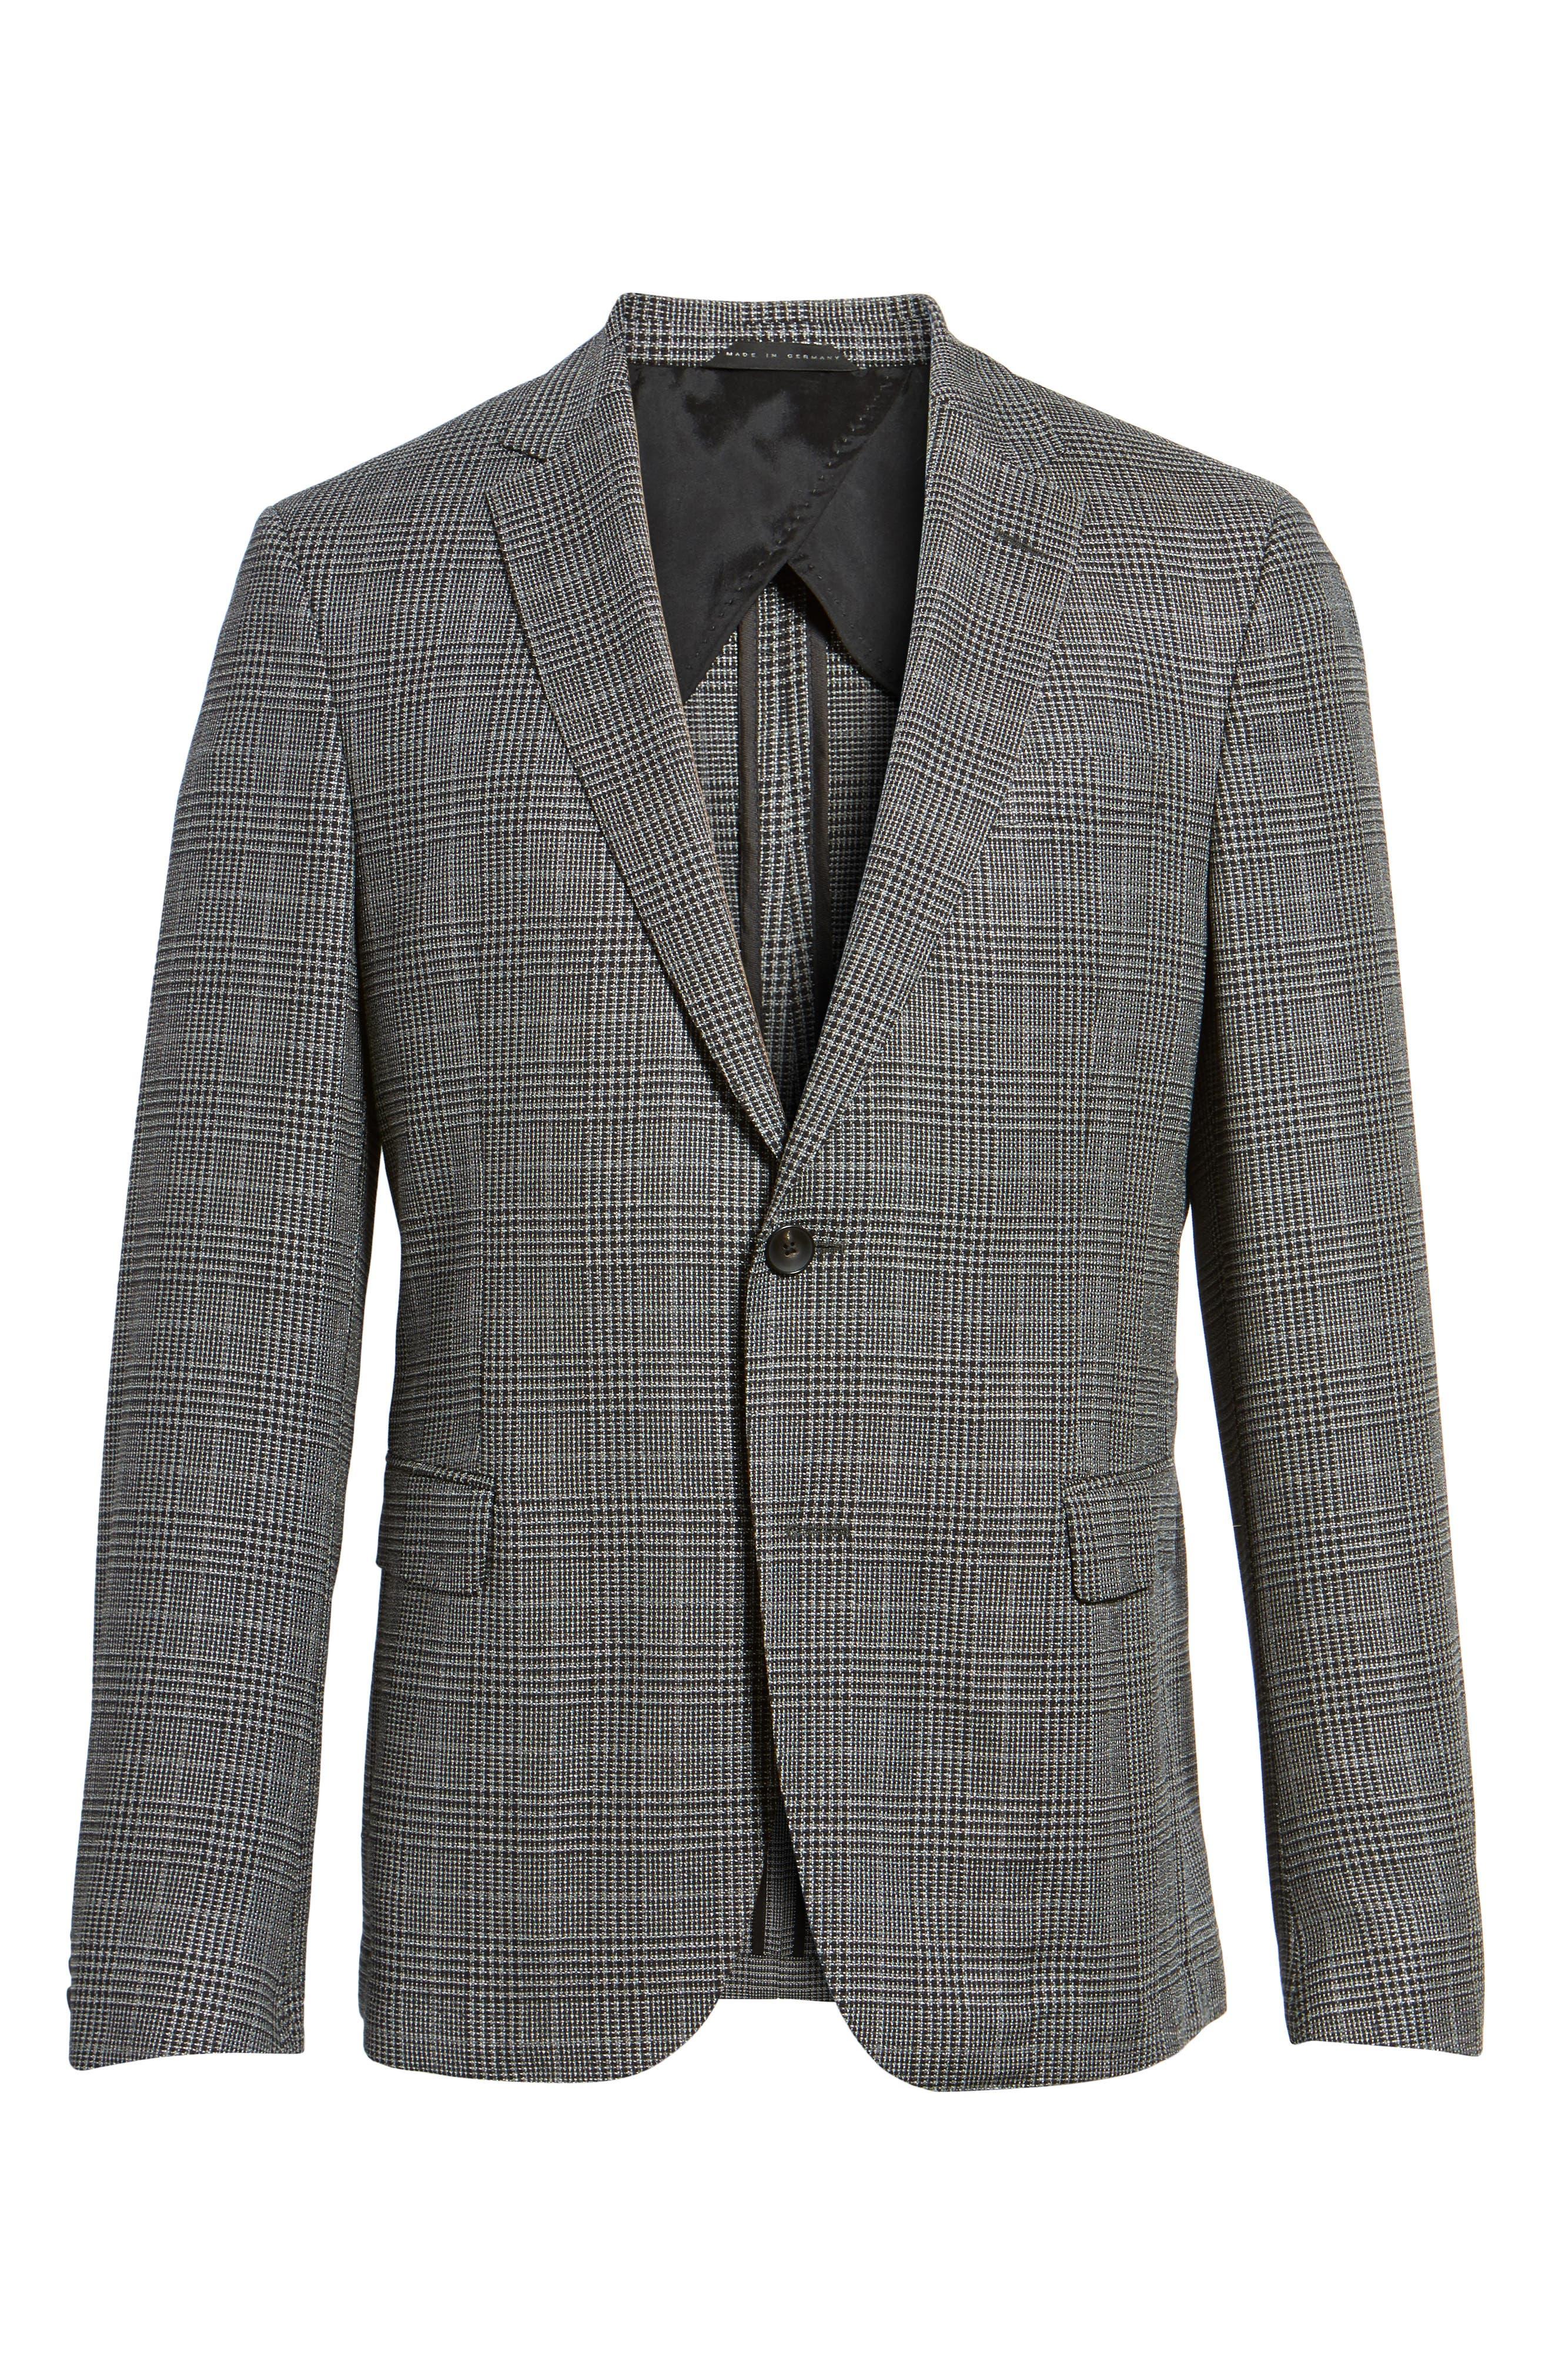 Nobis Trim Fit Plaid Wool & Silk Blend Sport Coat,                             Alternate thumbnail 5, color,                             OPEN GREY